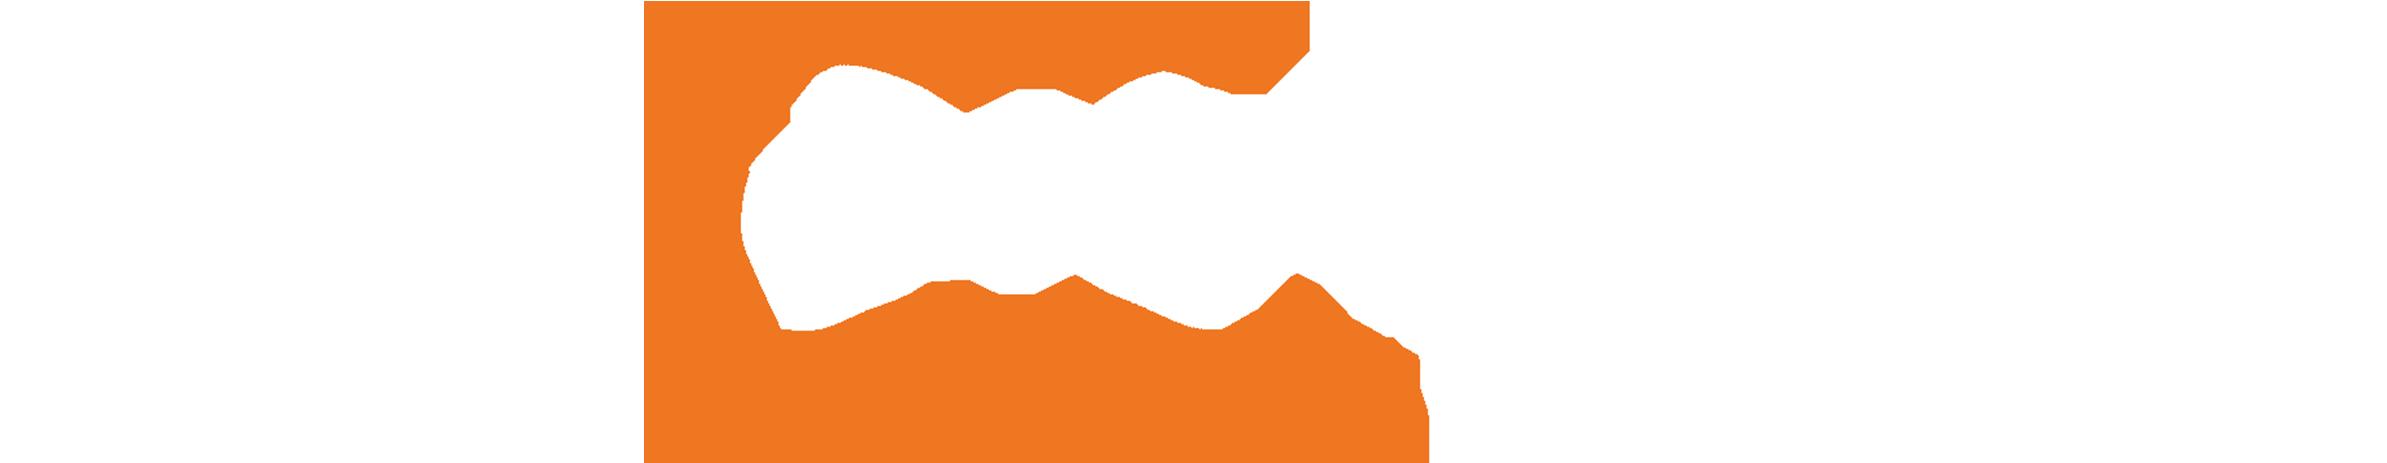 C4Game | Compare game prices